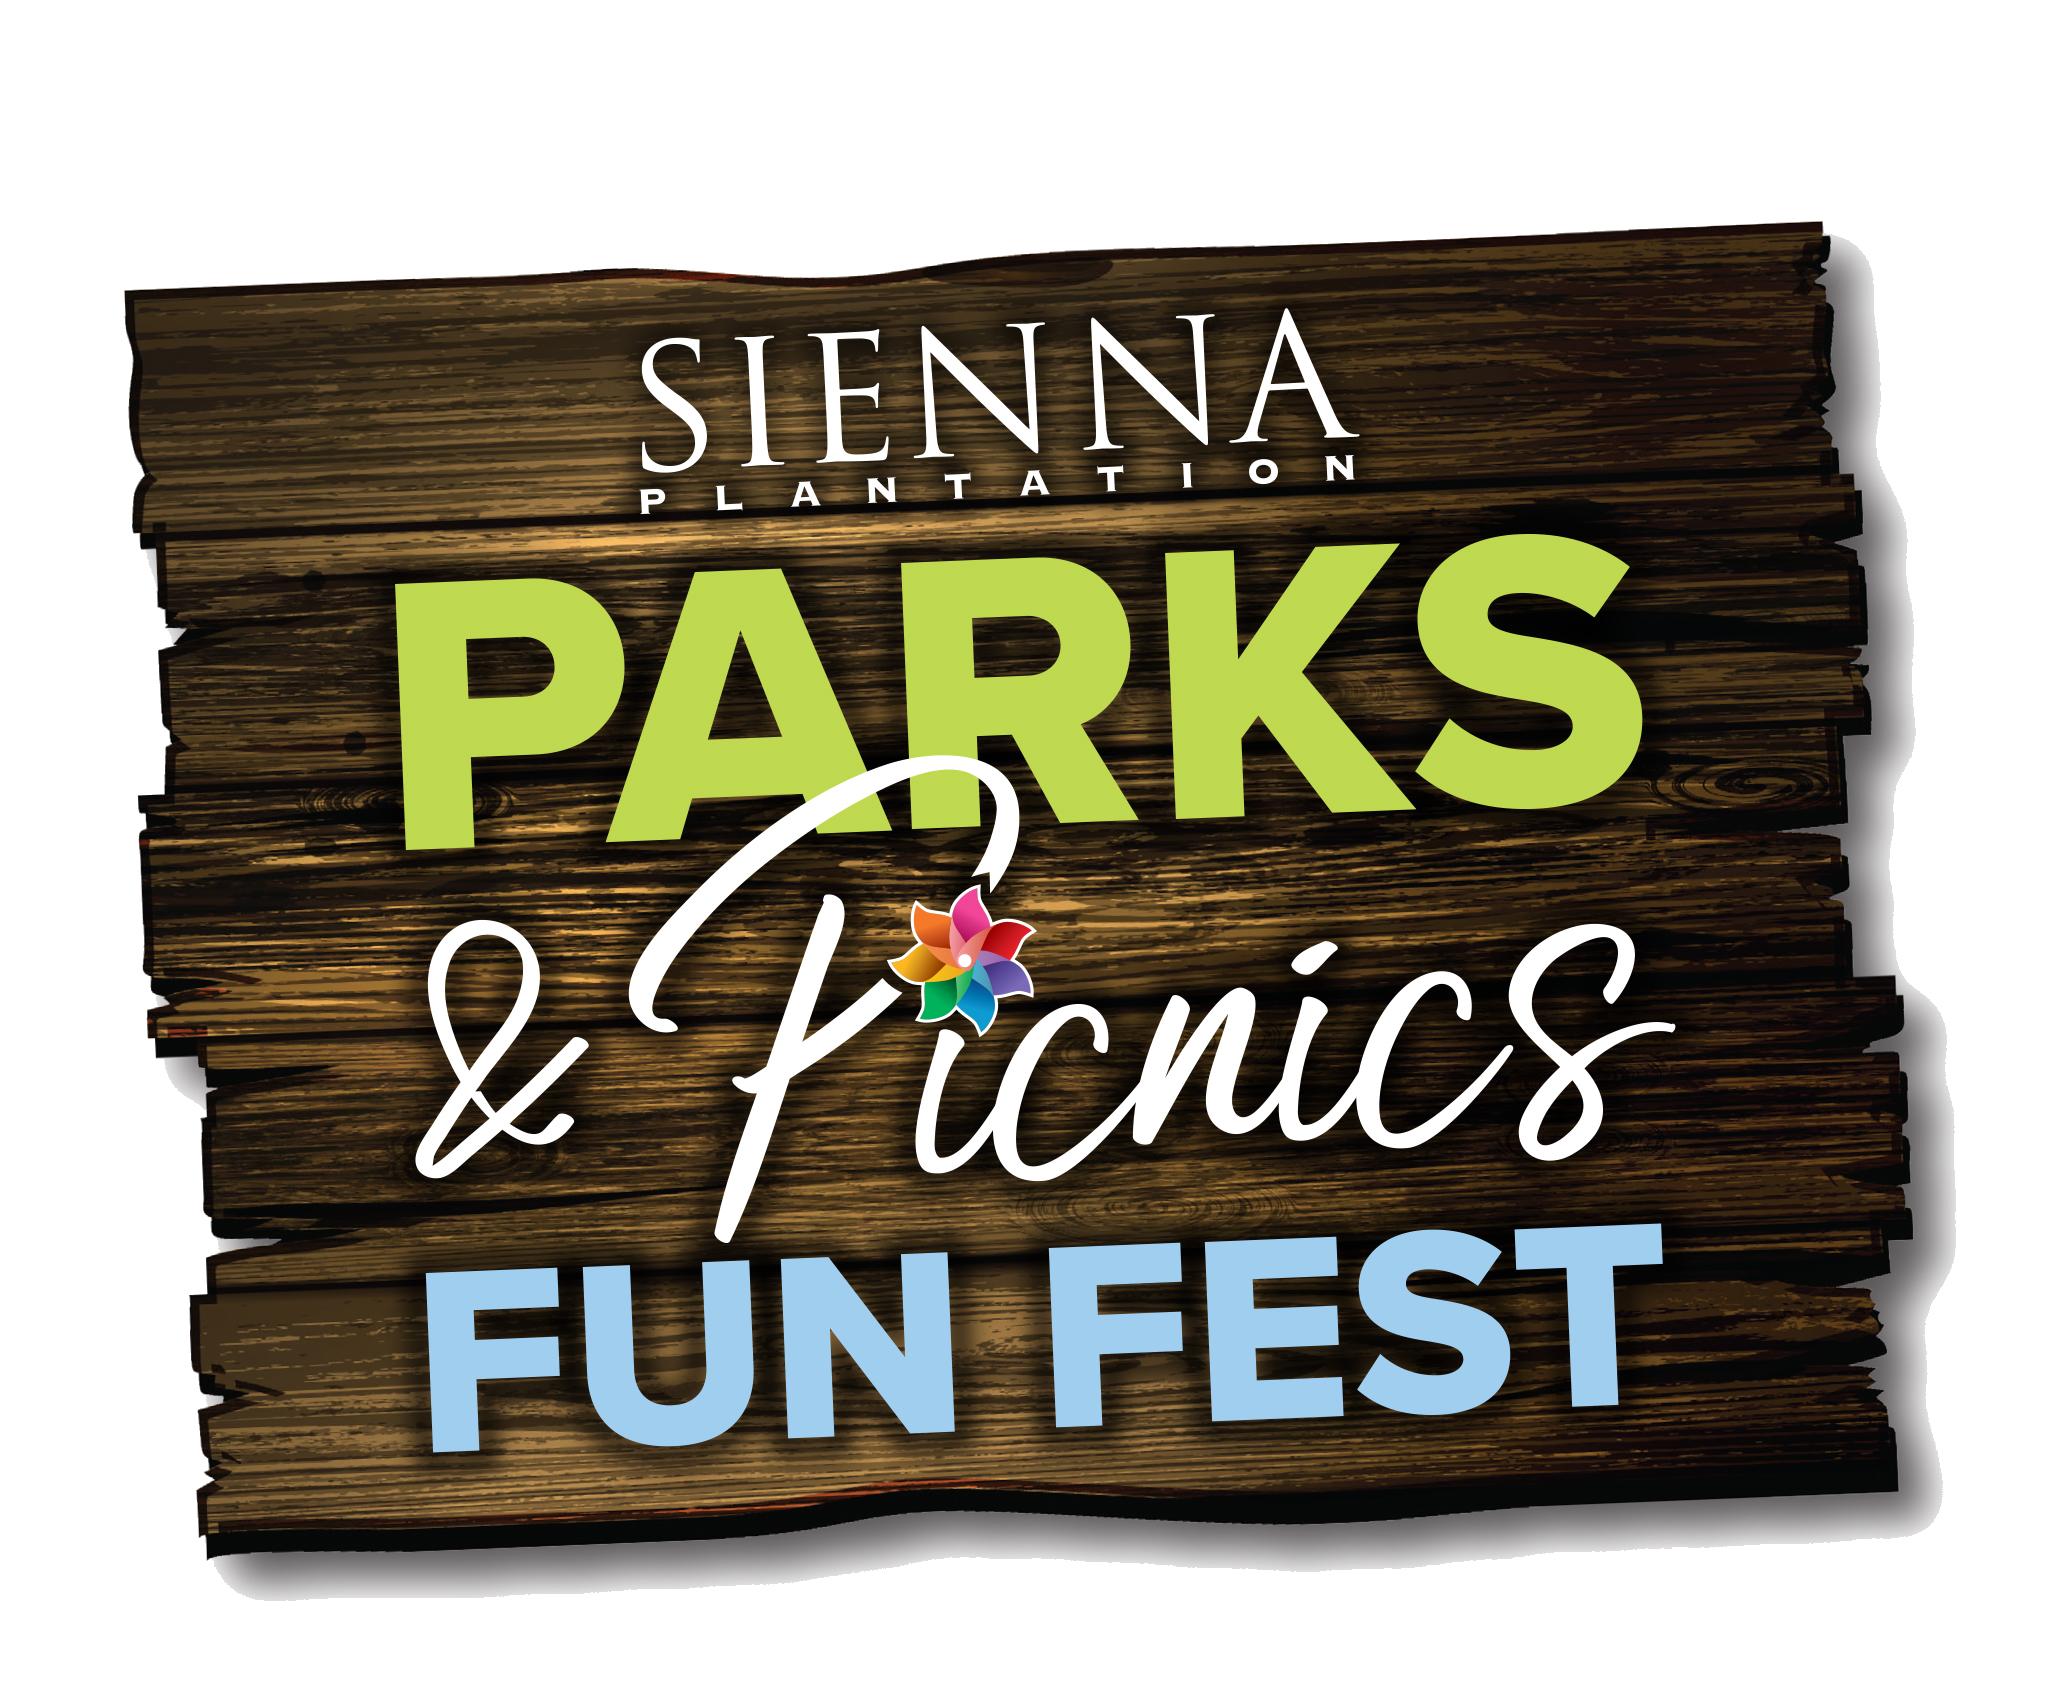 Parks and Picnics Fun fest